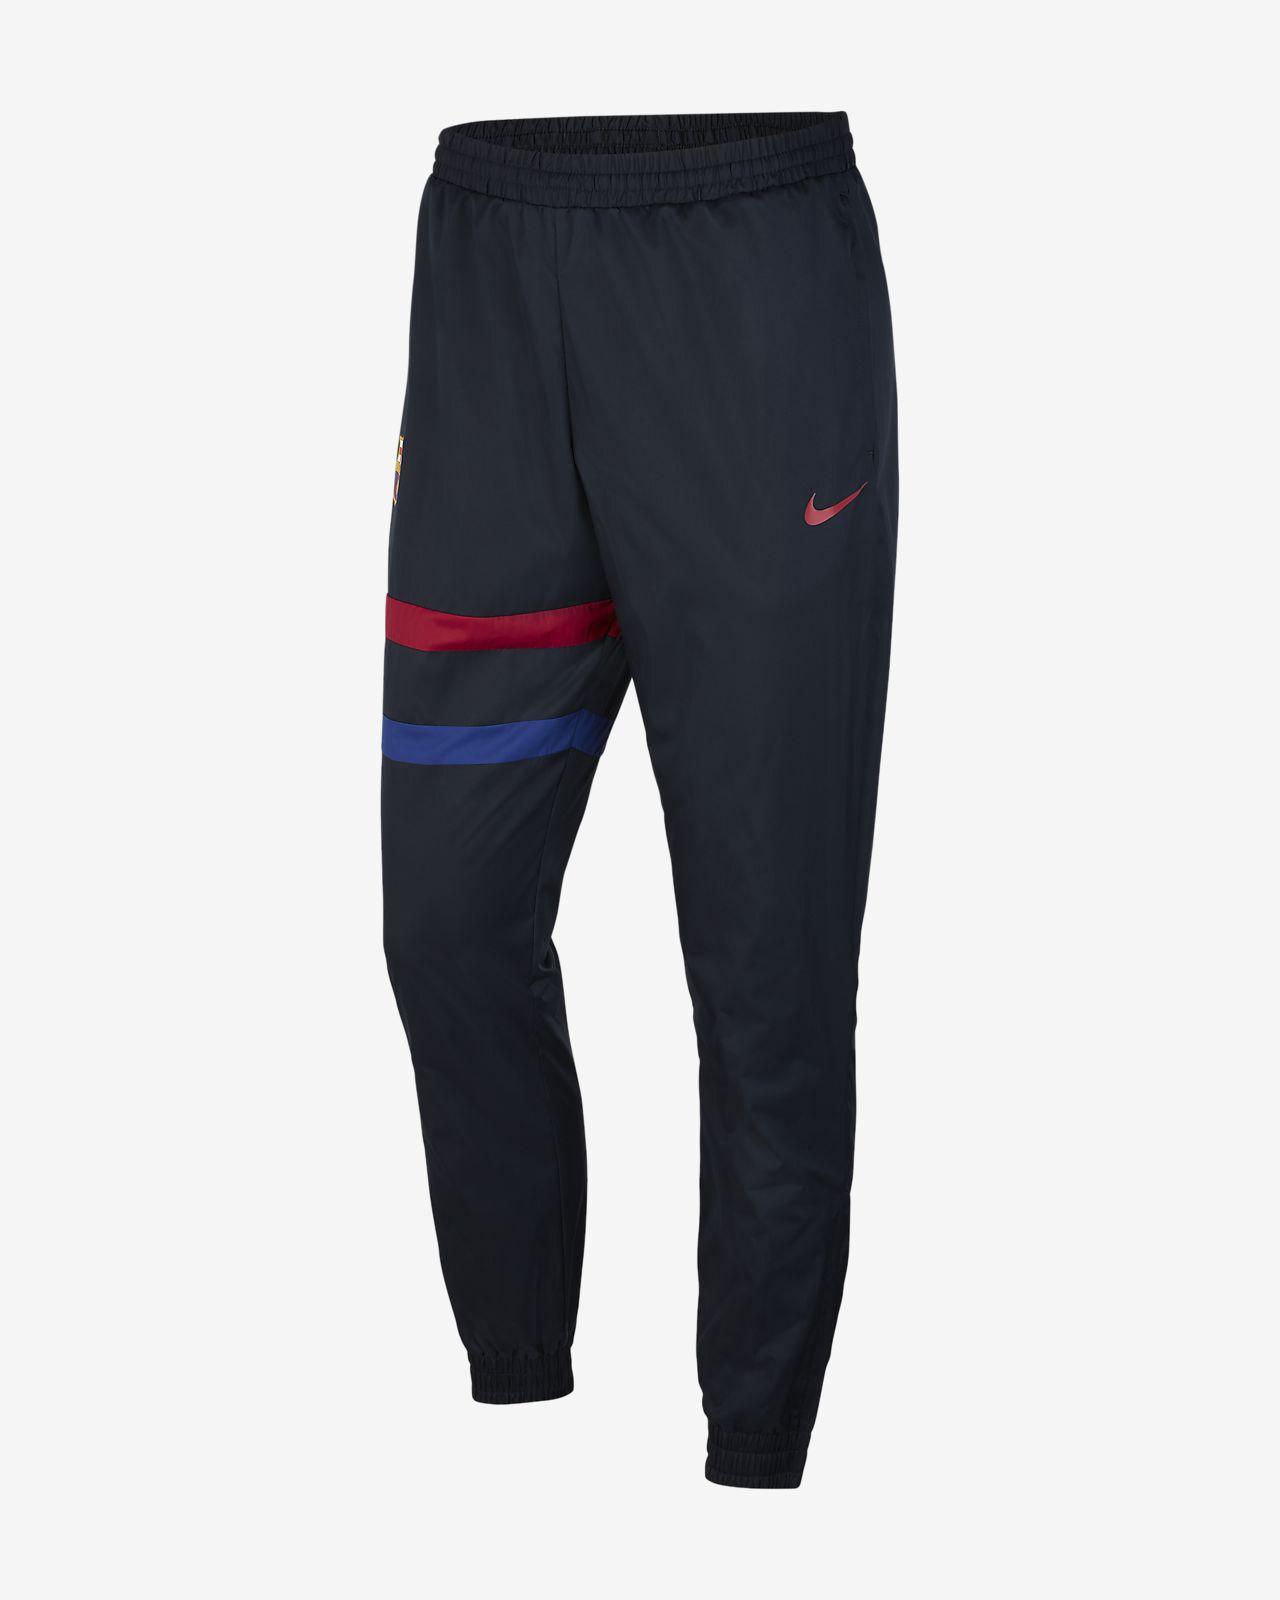 FC Barcelona Men's Track Pants